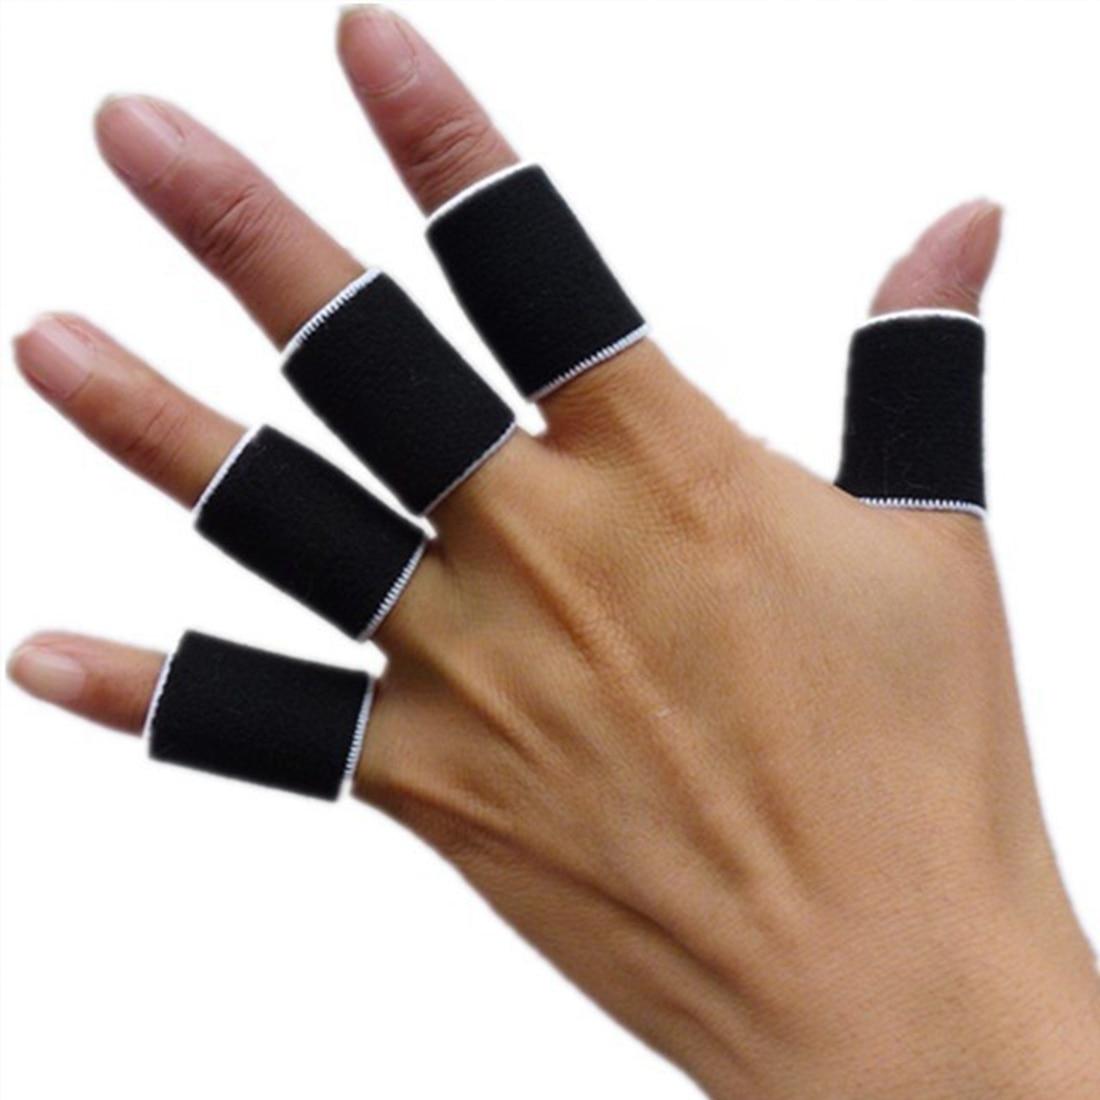 10Pcs Sports Finger Splint Guard Bands Bandage Support ...